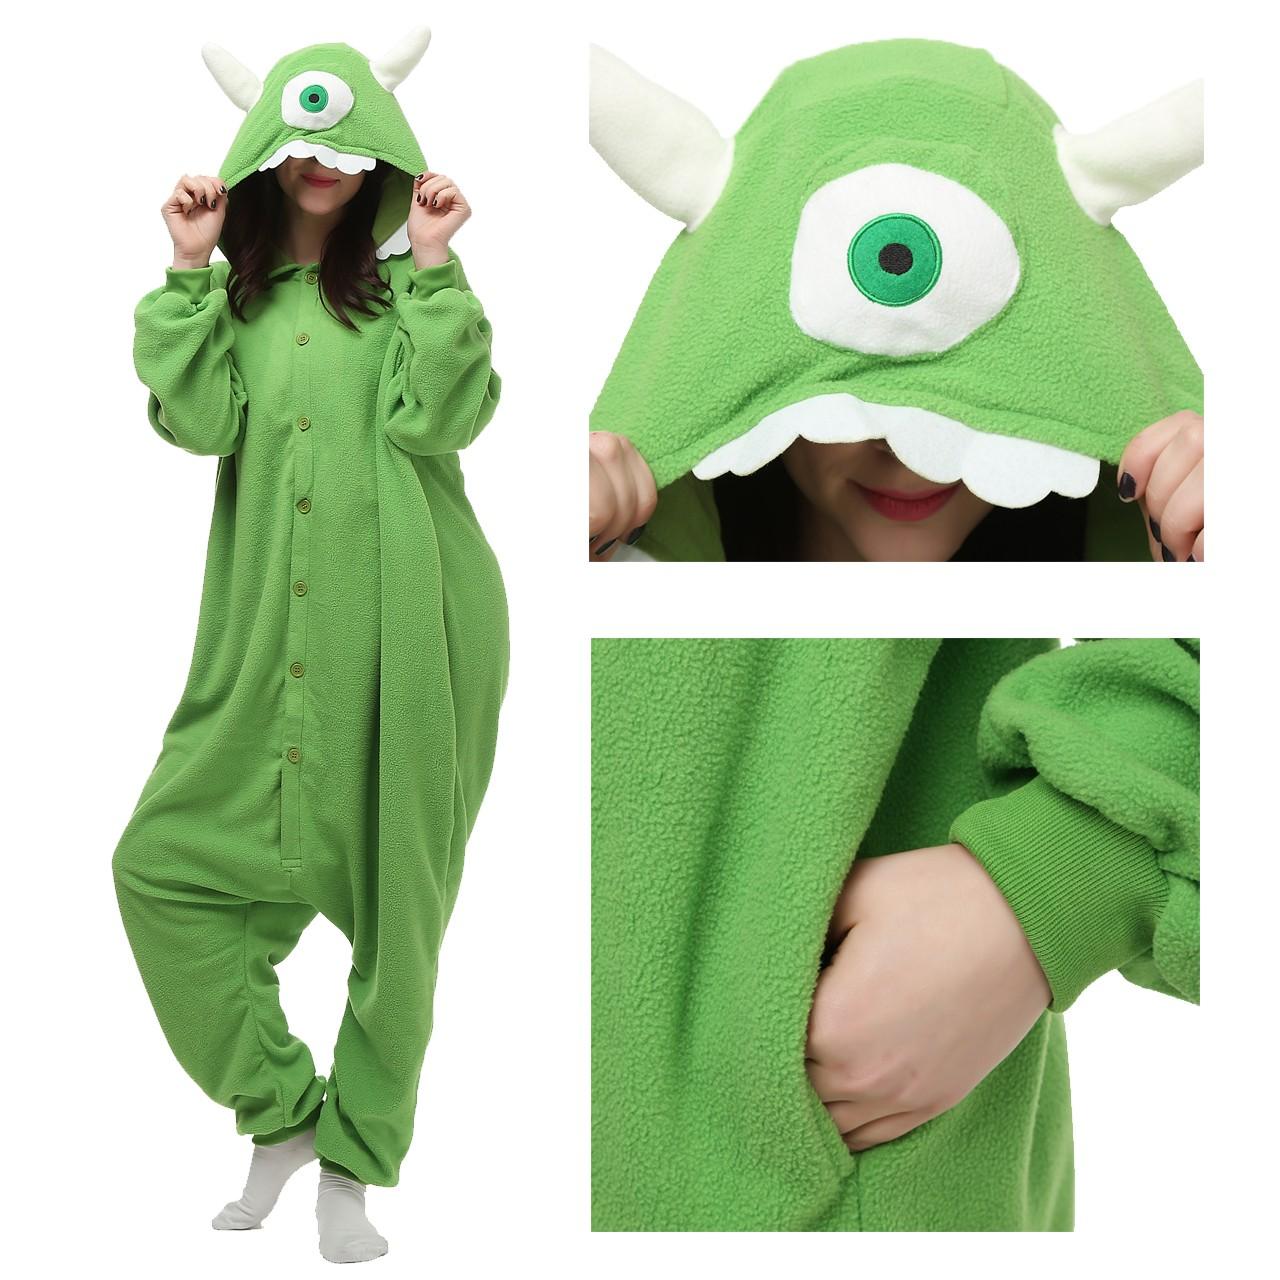 7b3349d6d2f1 One Eyed Monster Onesie Kigurumi Cartoon Pajama for adult Disney Monsters  Inc Costumes